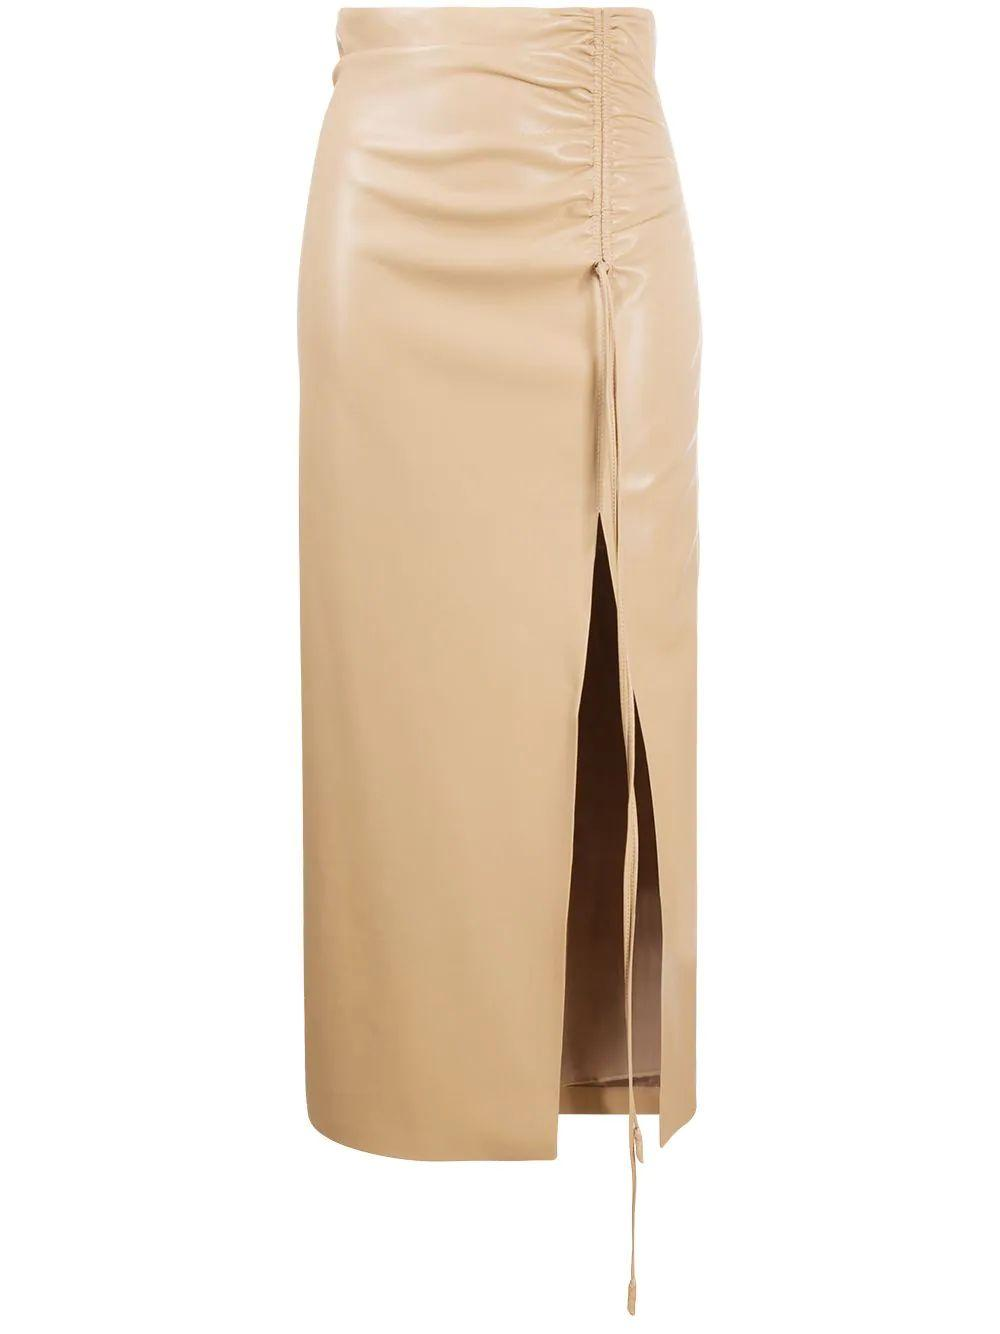 Malorie Vegan Leather Midi Skirt